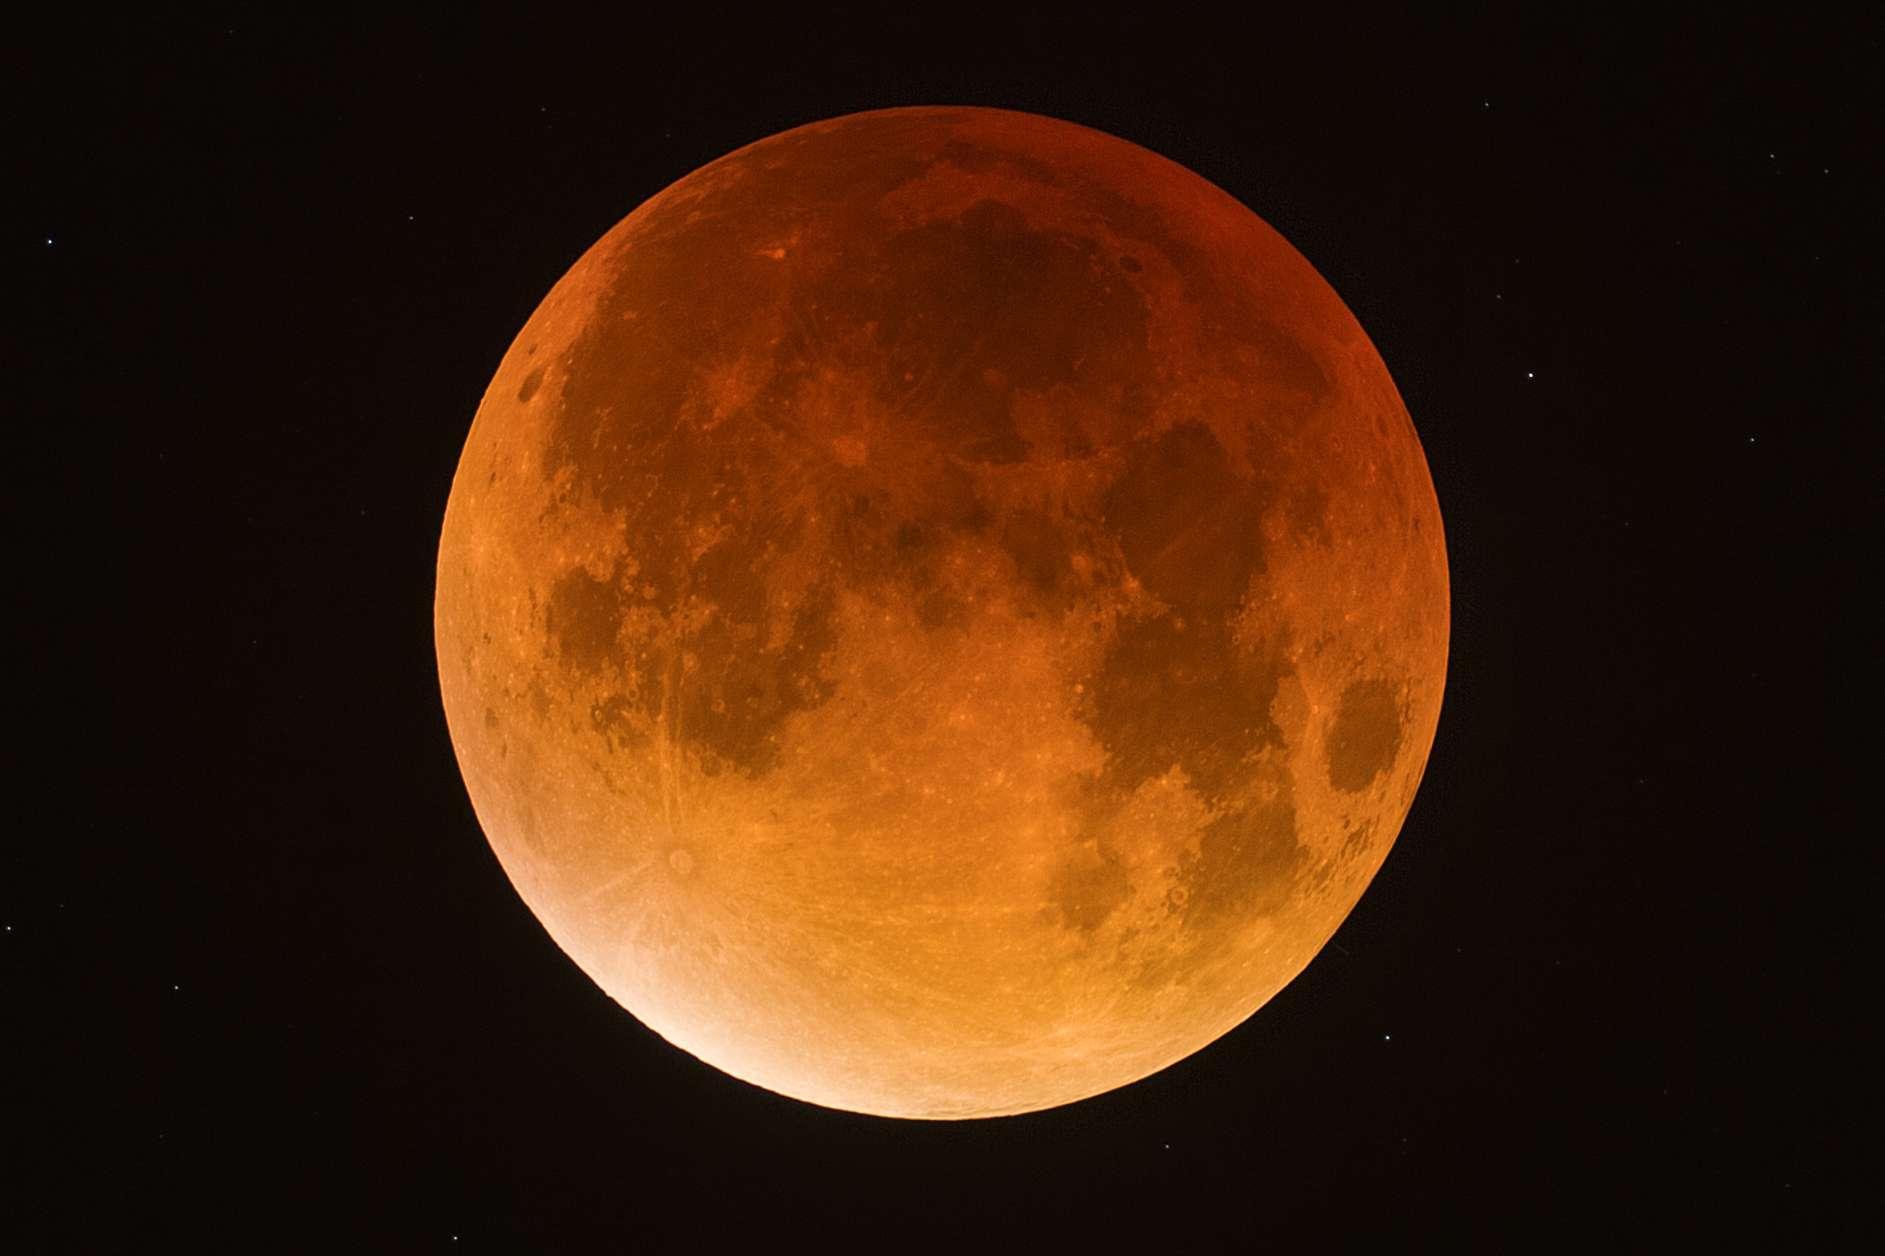 Photo eclipse de lune 2015 Maximu10